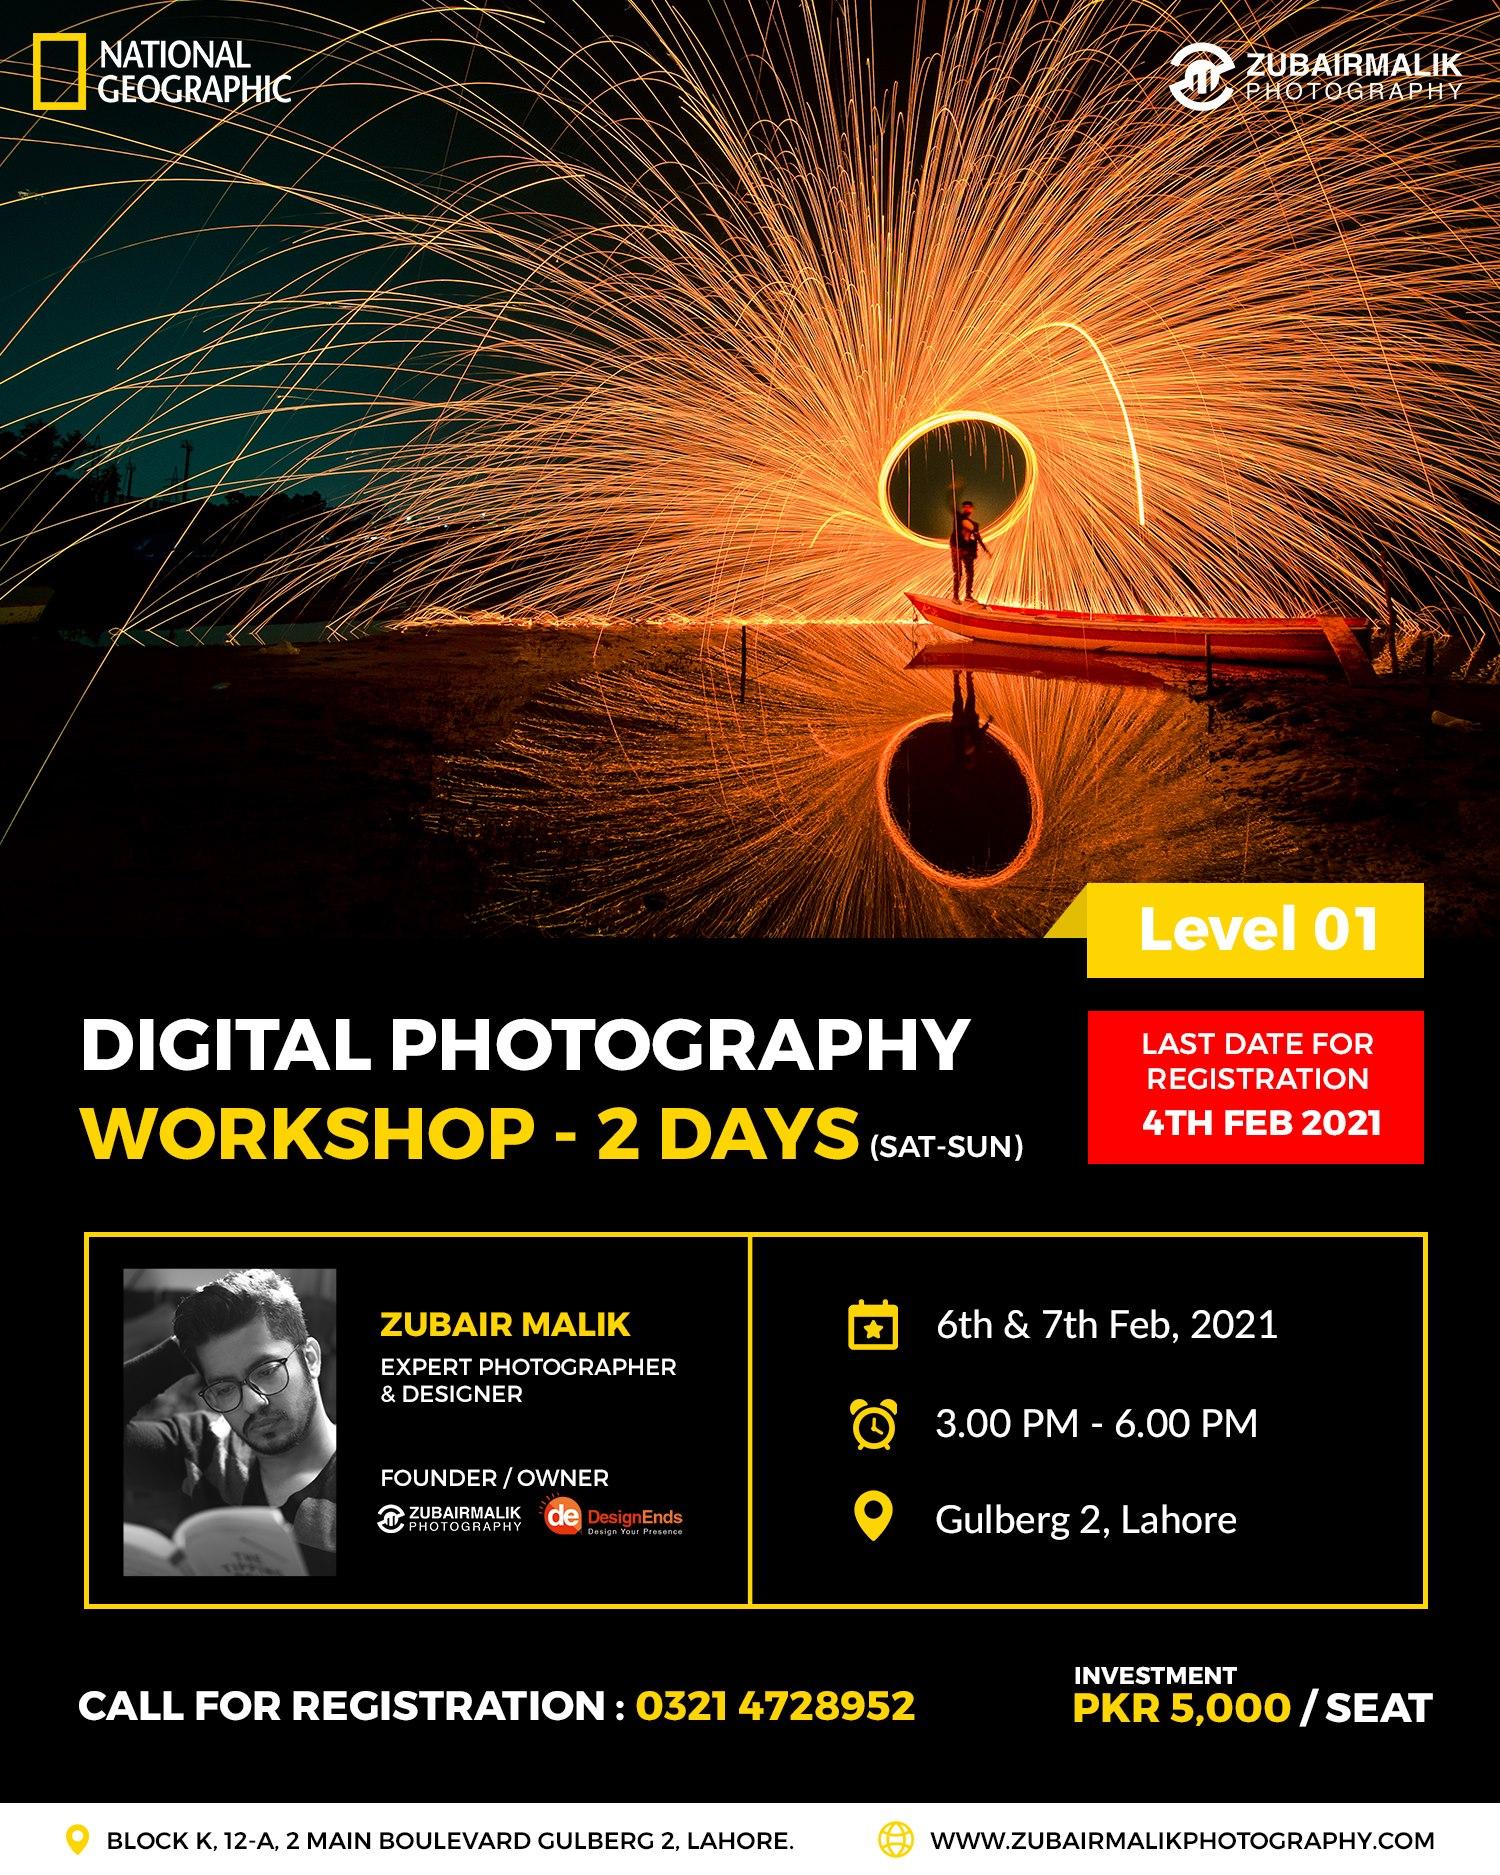 Digital Photography Workshop | ZUBAIR MALIK PHOTOGRAPHY | 06 Feb, 2021